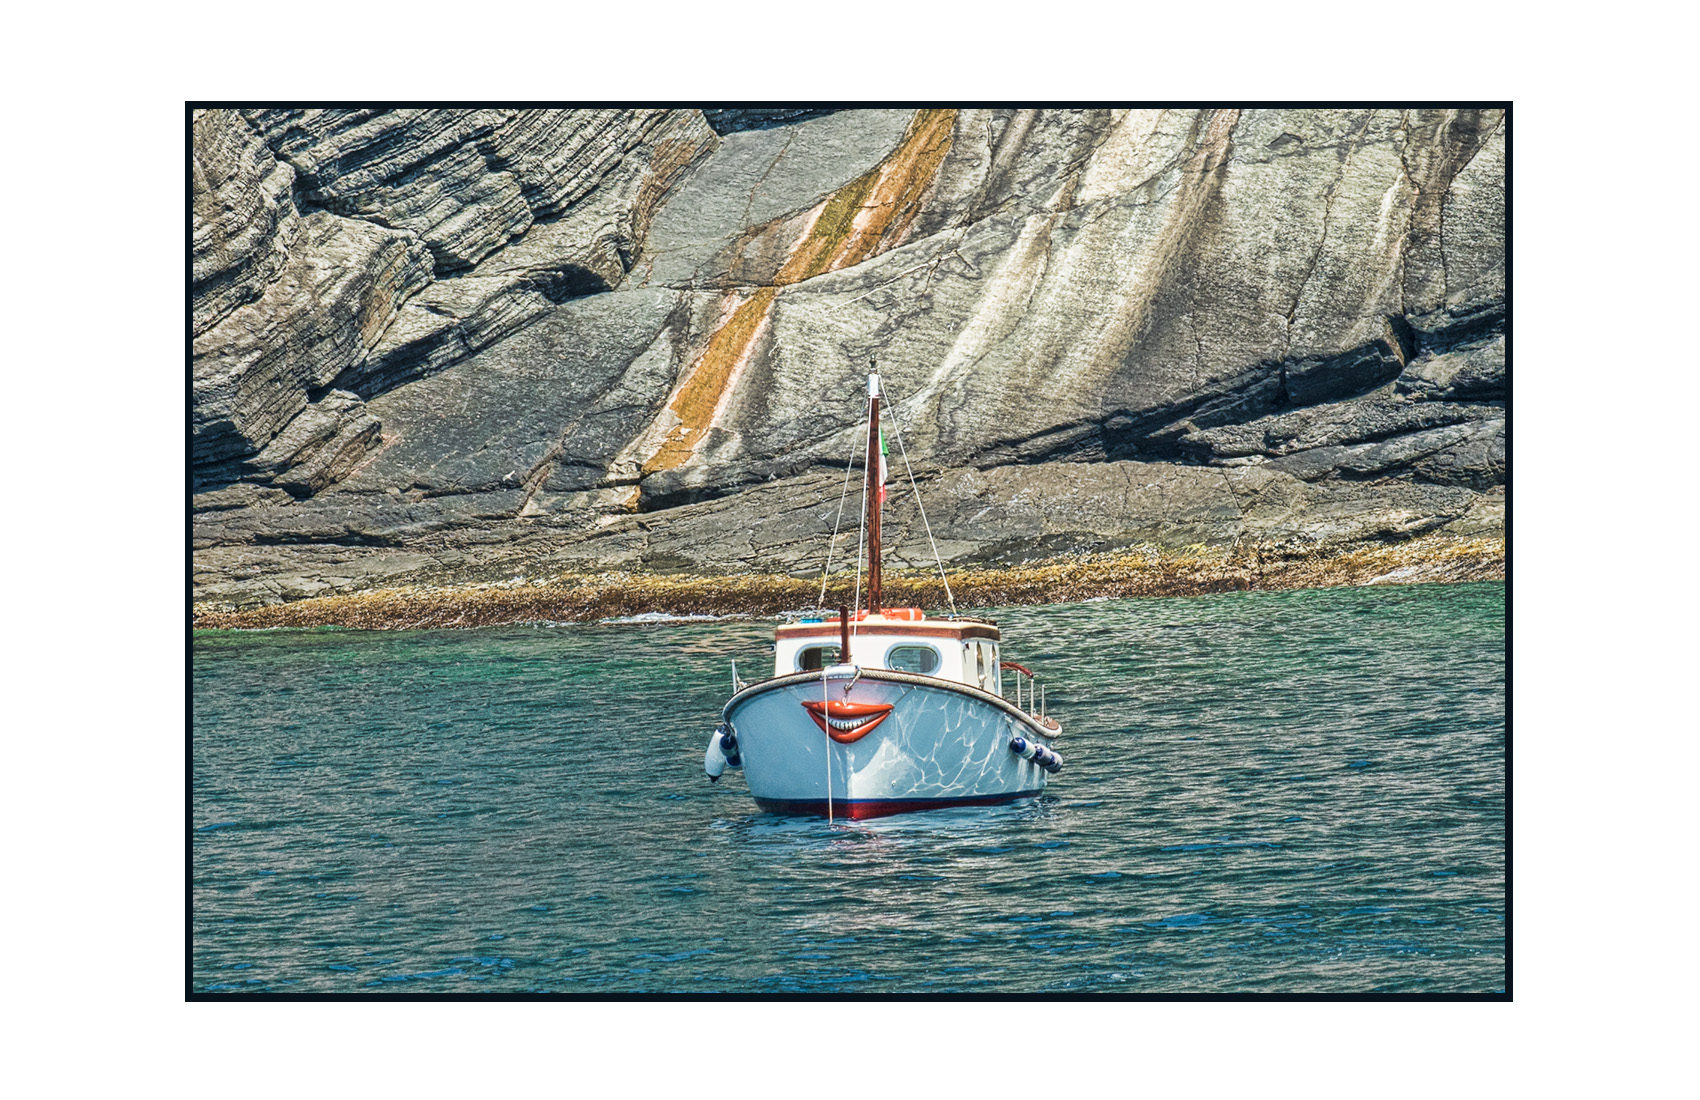 Happy Sailing.